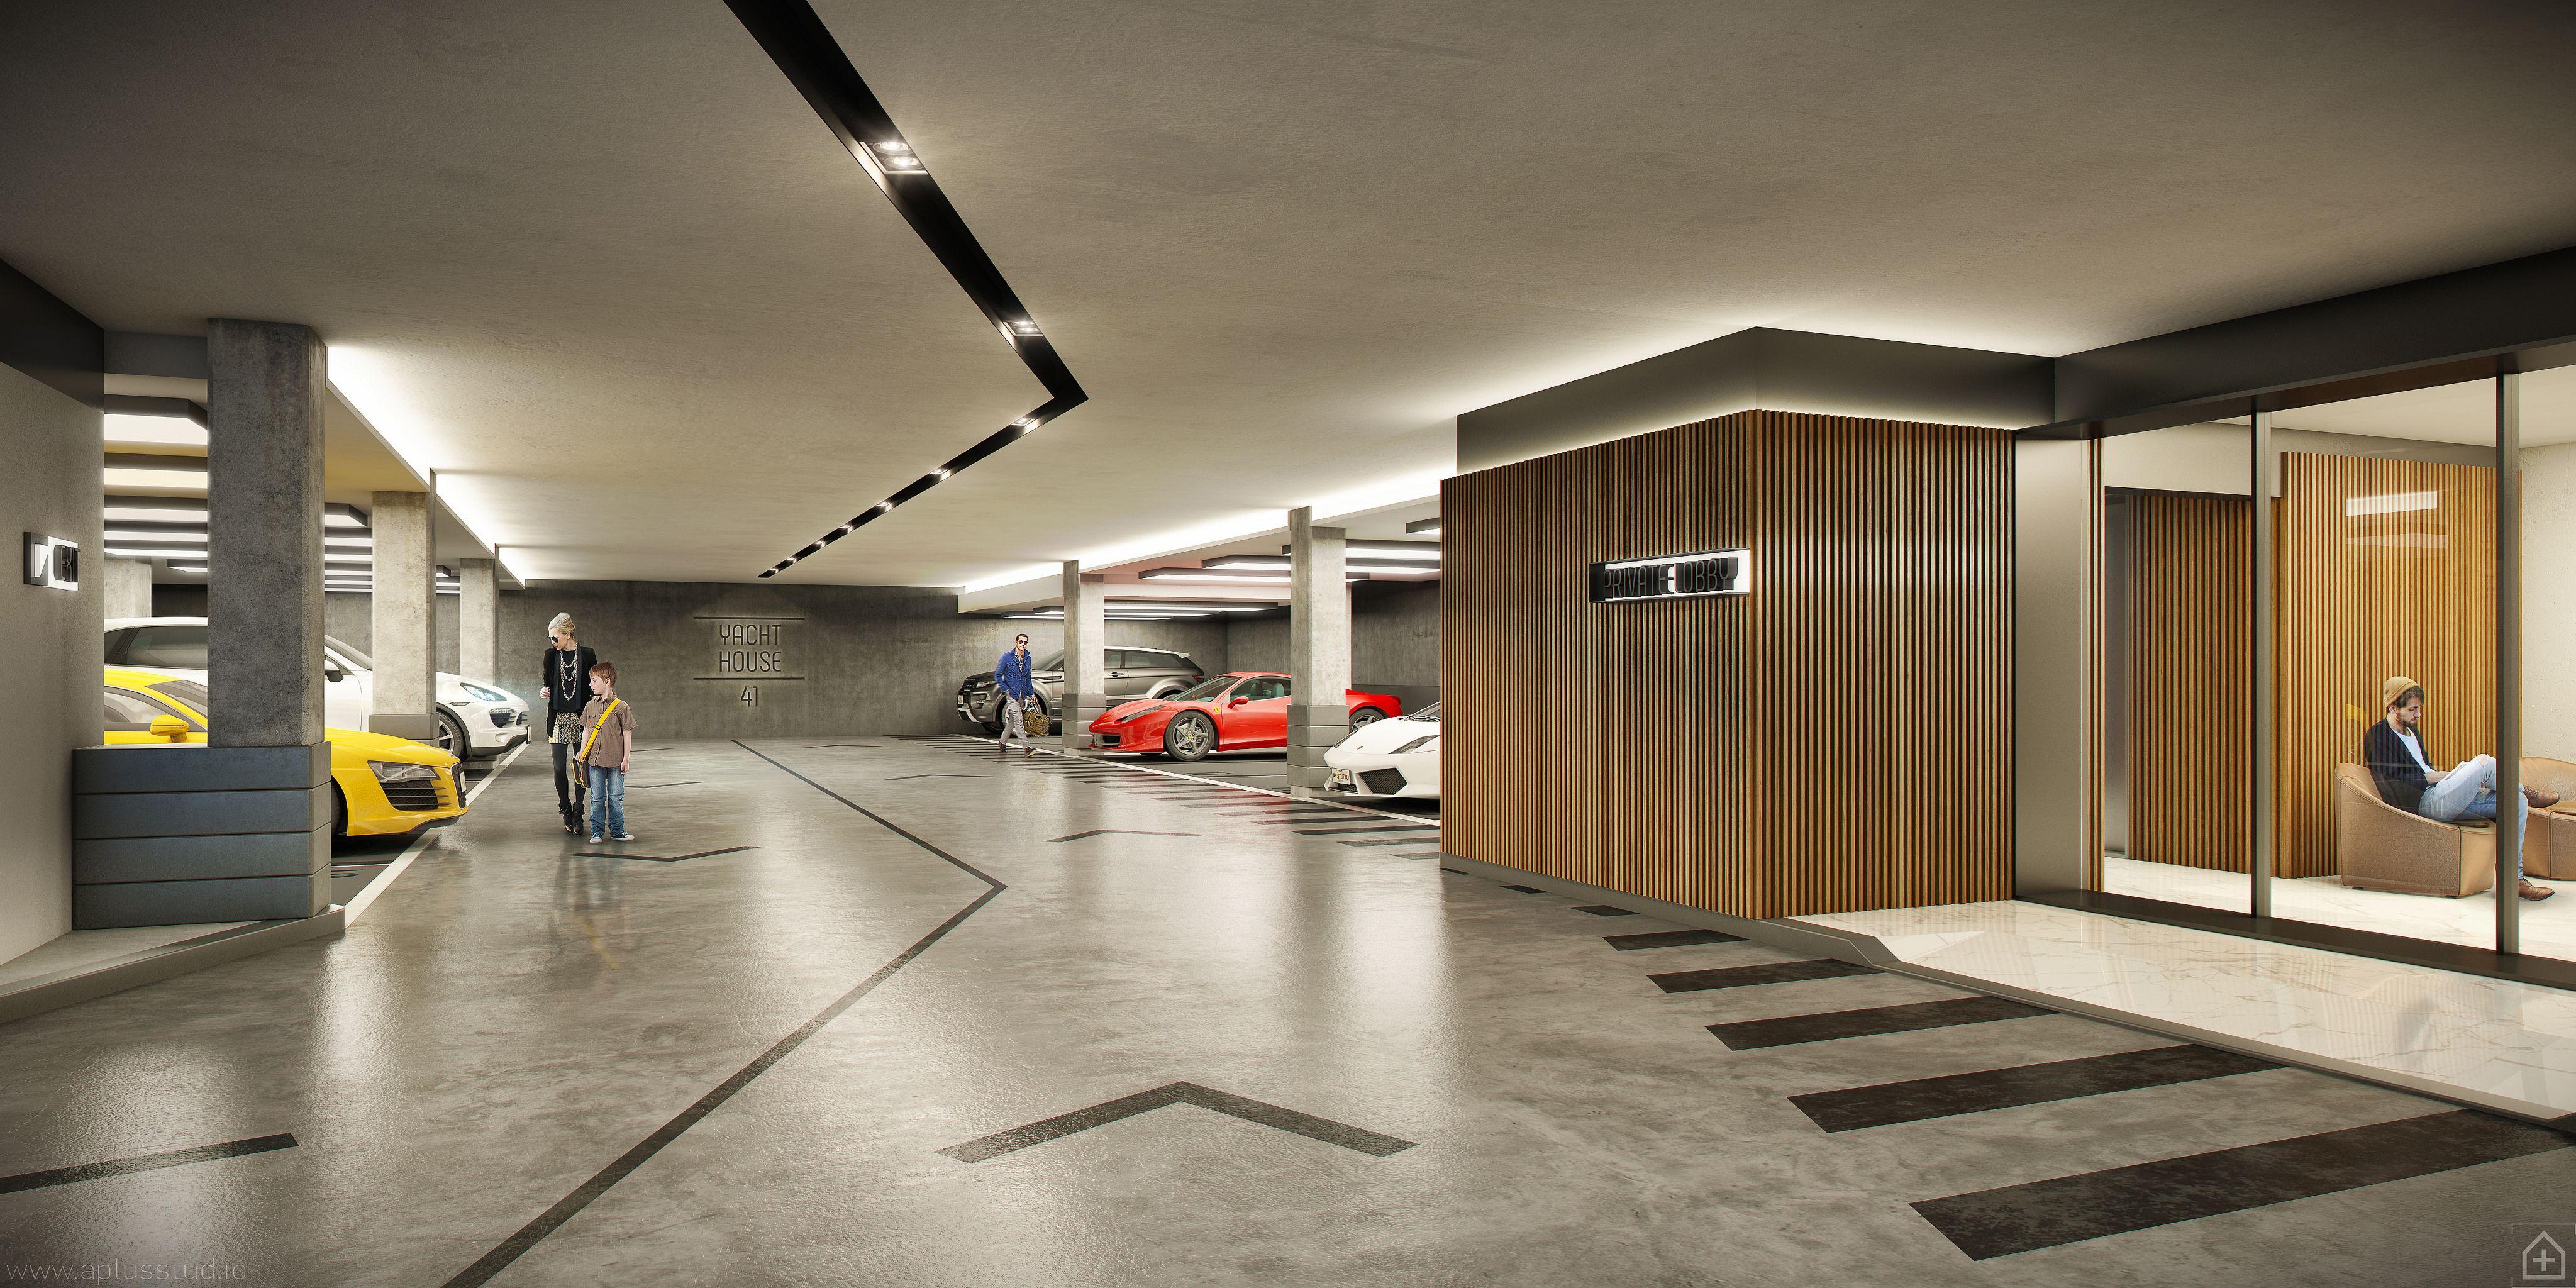 poda_arquitectos_ocean_reef_a+studio Architect, House